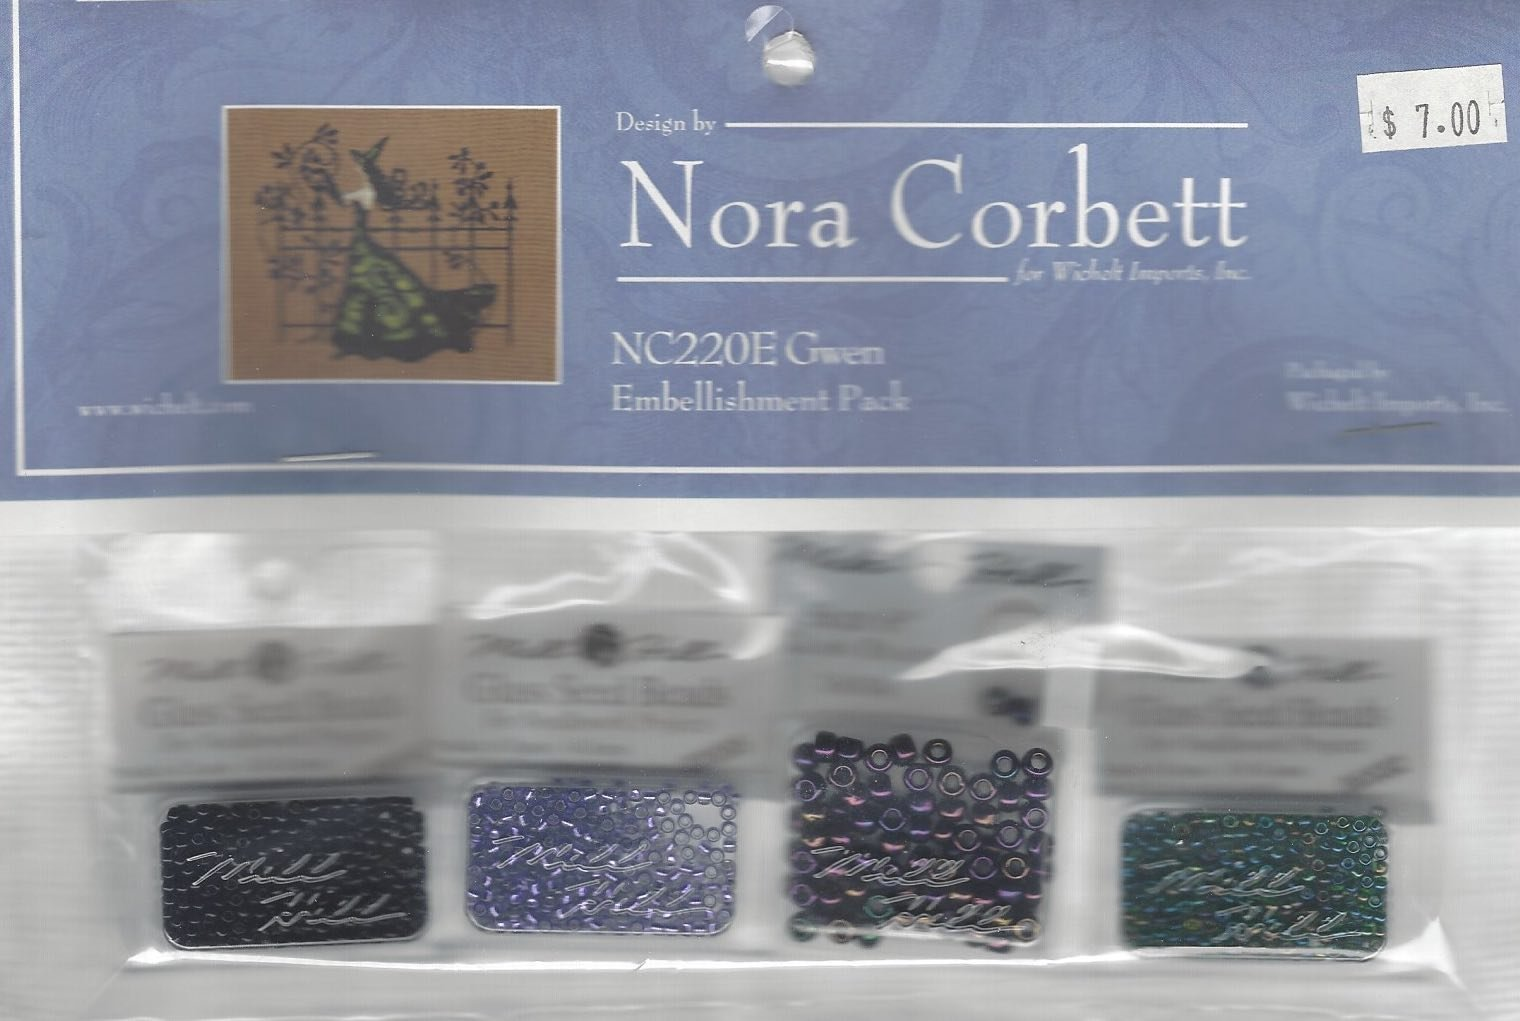 Nora Corbett NC220E